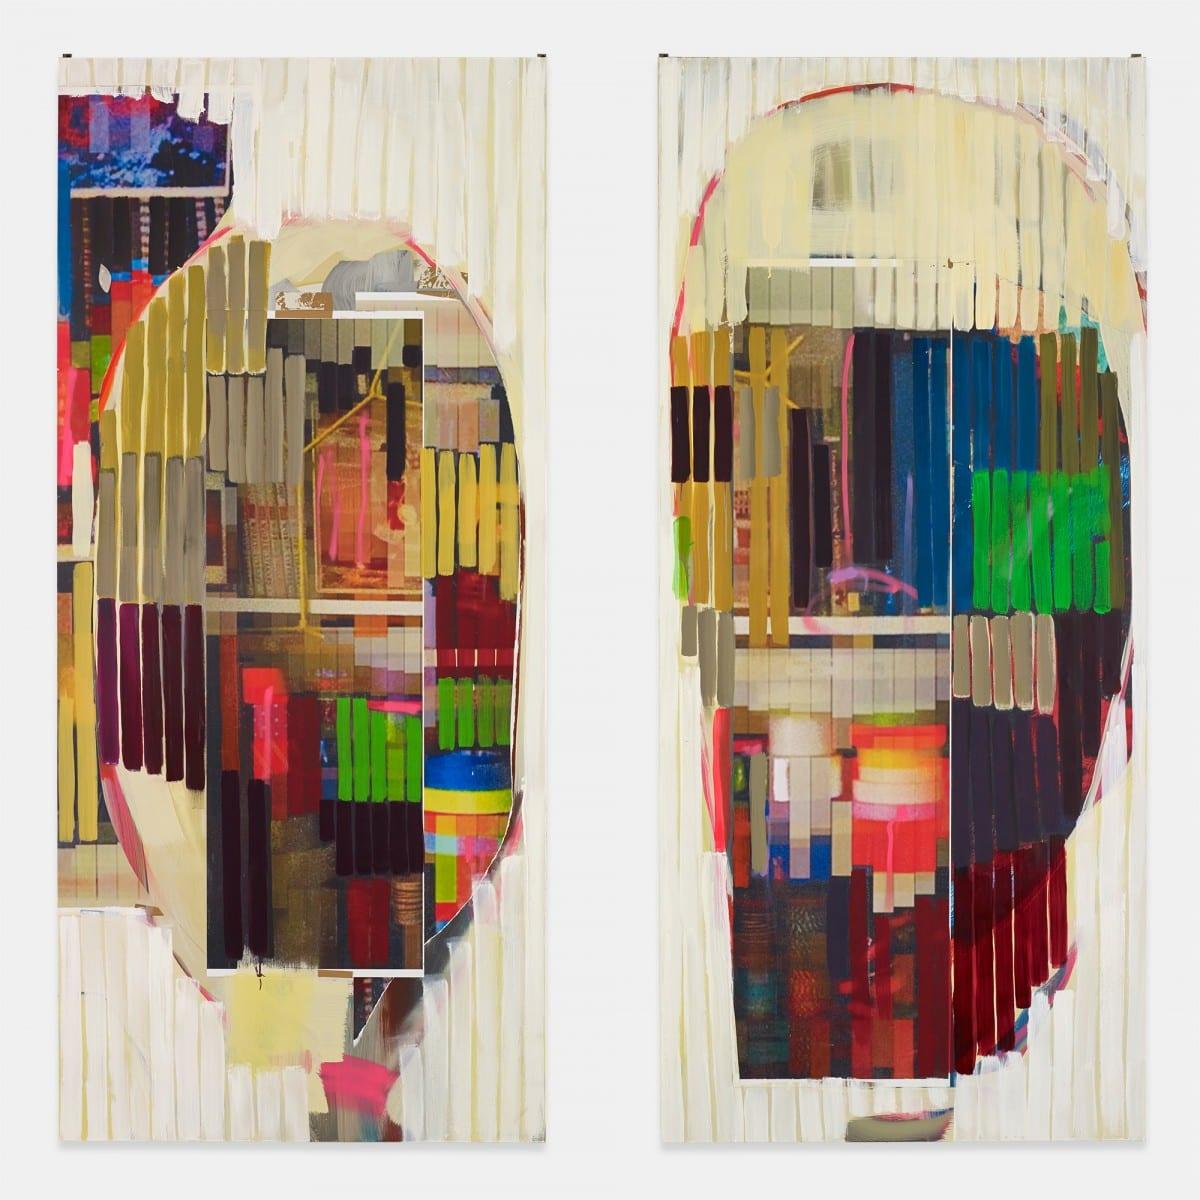 "Michael, John Kelly, Mask 12, Oil, Acrylic, Cel Vinyl, Pigment Print Collage on Panel, 80"" x 80"", 2013"